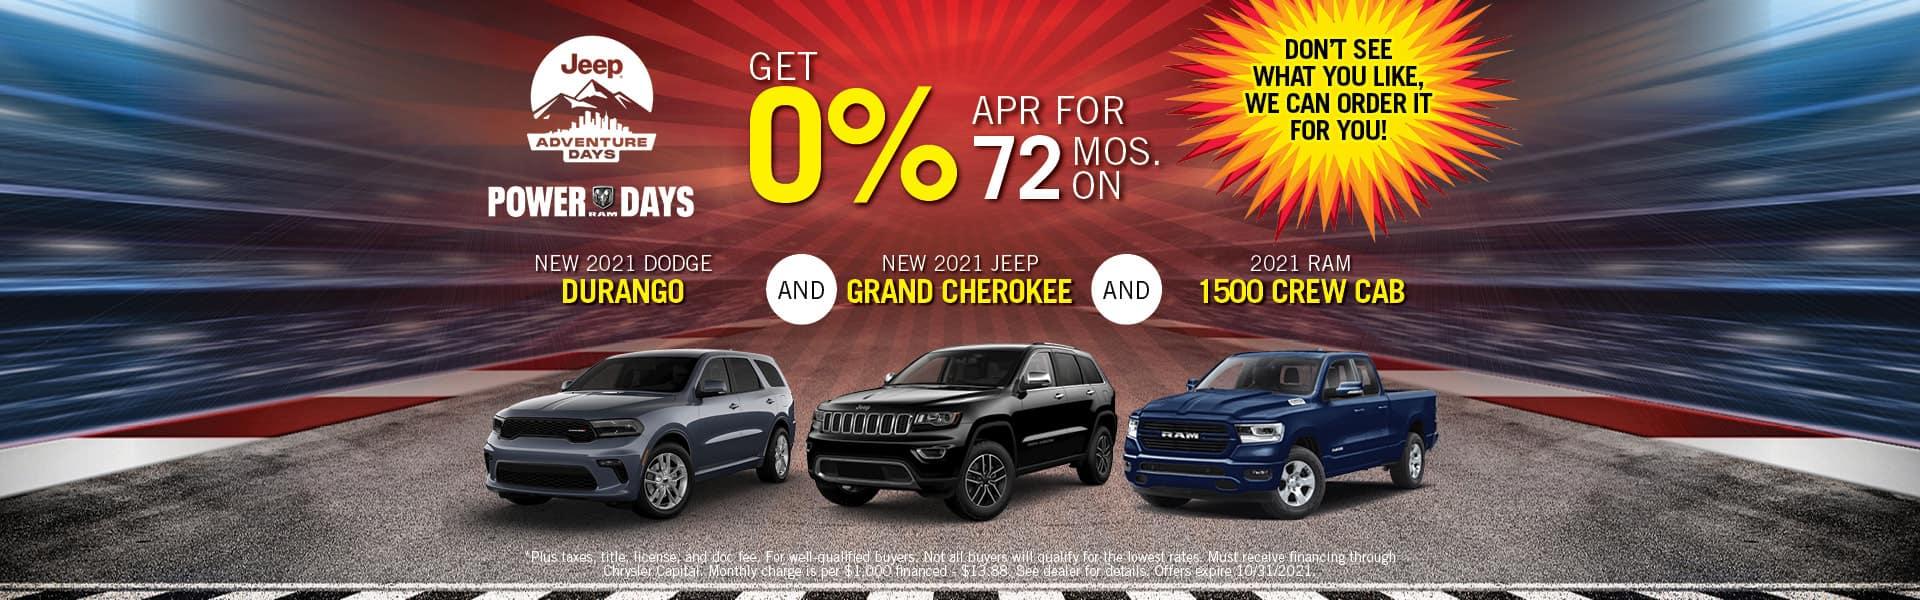 2021 Dodge Durango, Jeep Grand Cherokee & Ram 1500 Special Offers   Redlands CDJR